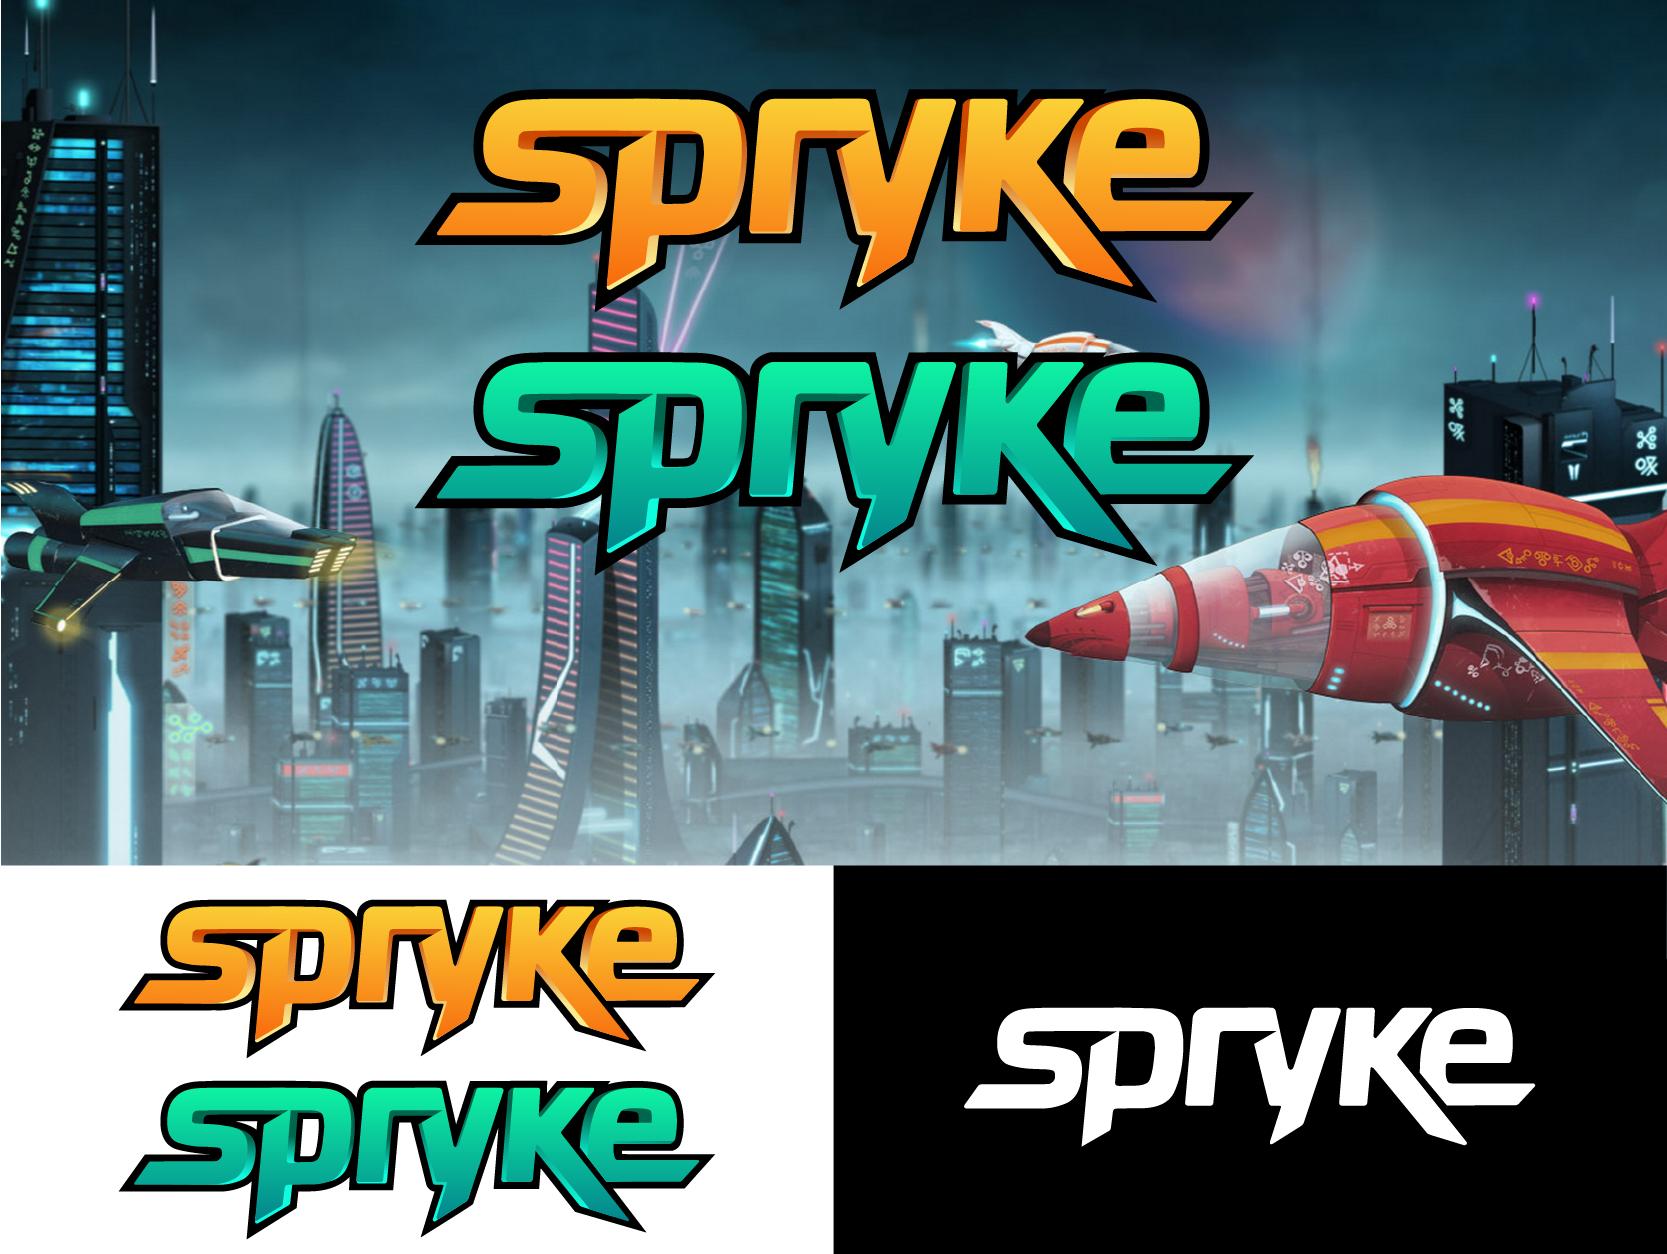 Create a slick logo for a scifi videogame